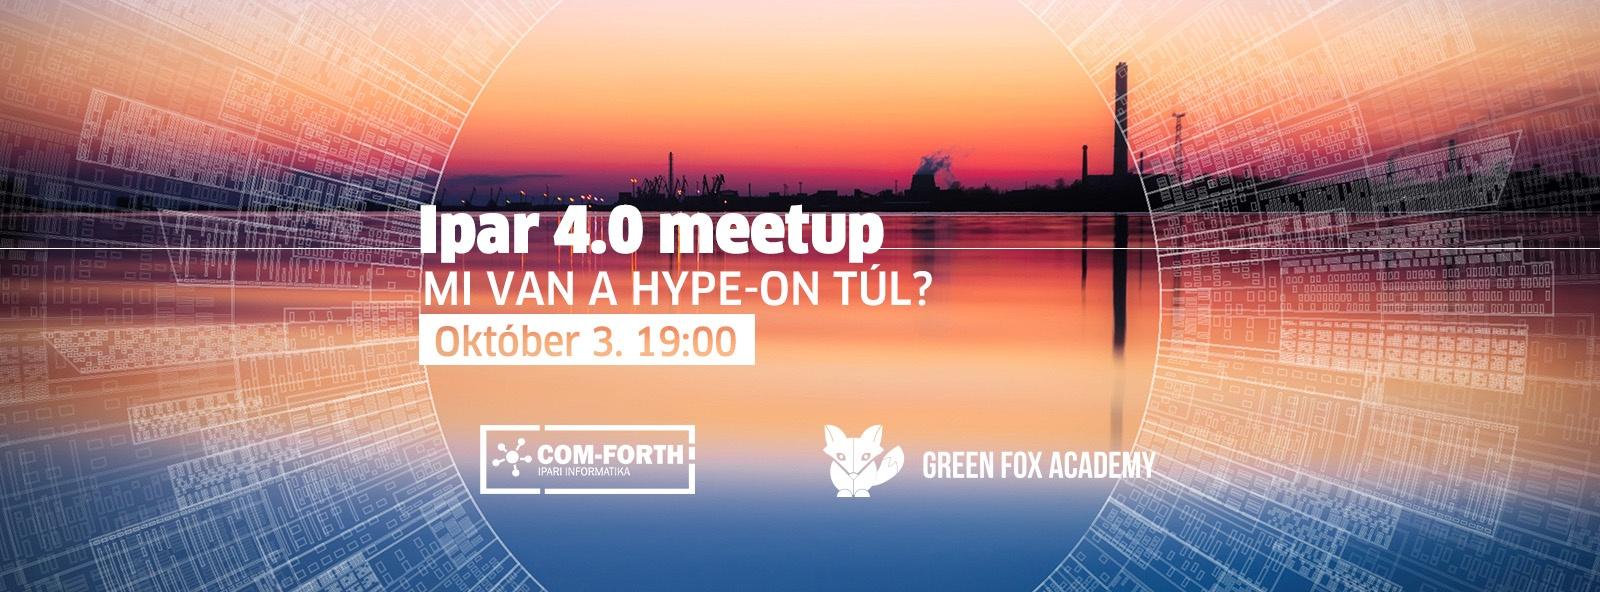 Ipar_4.0_meet_up_Com_Forth_Green_Fox.jpg